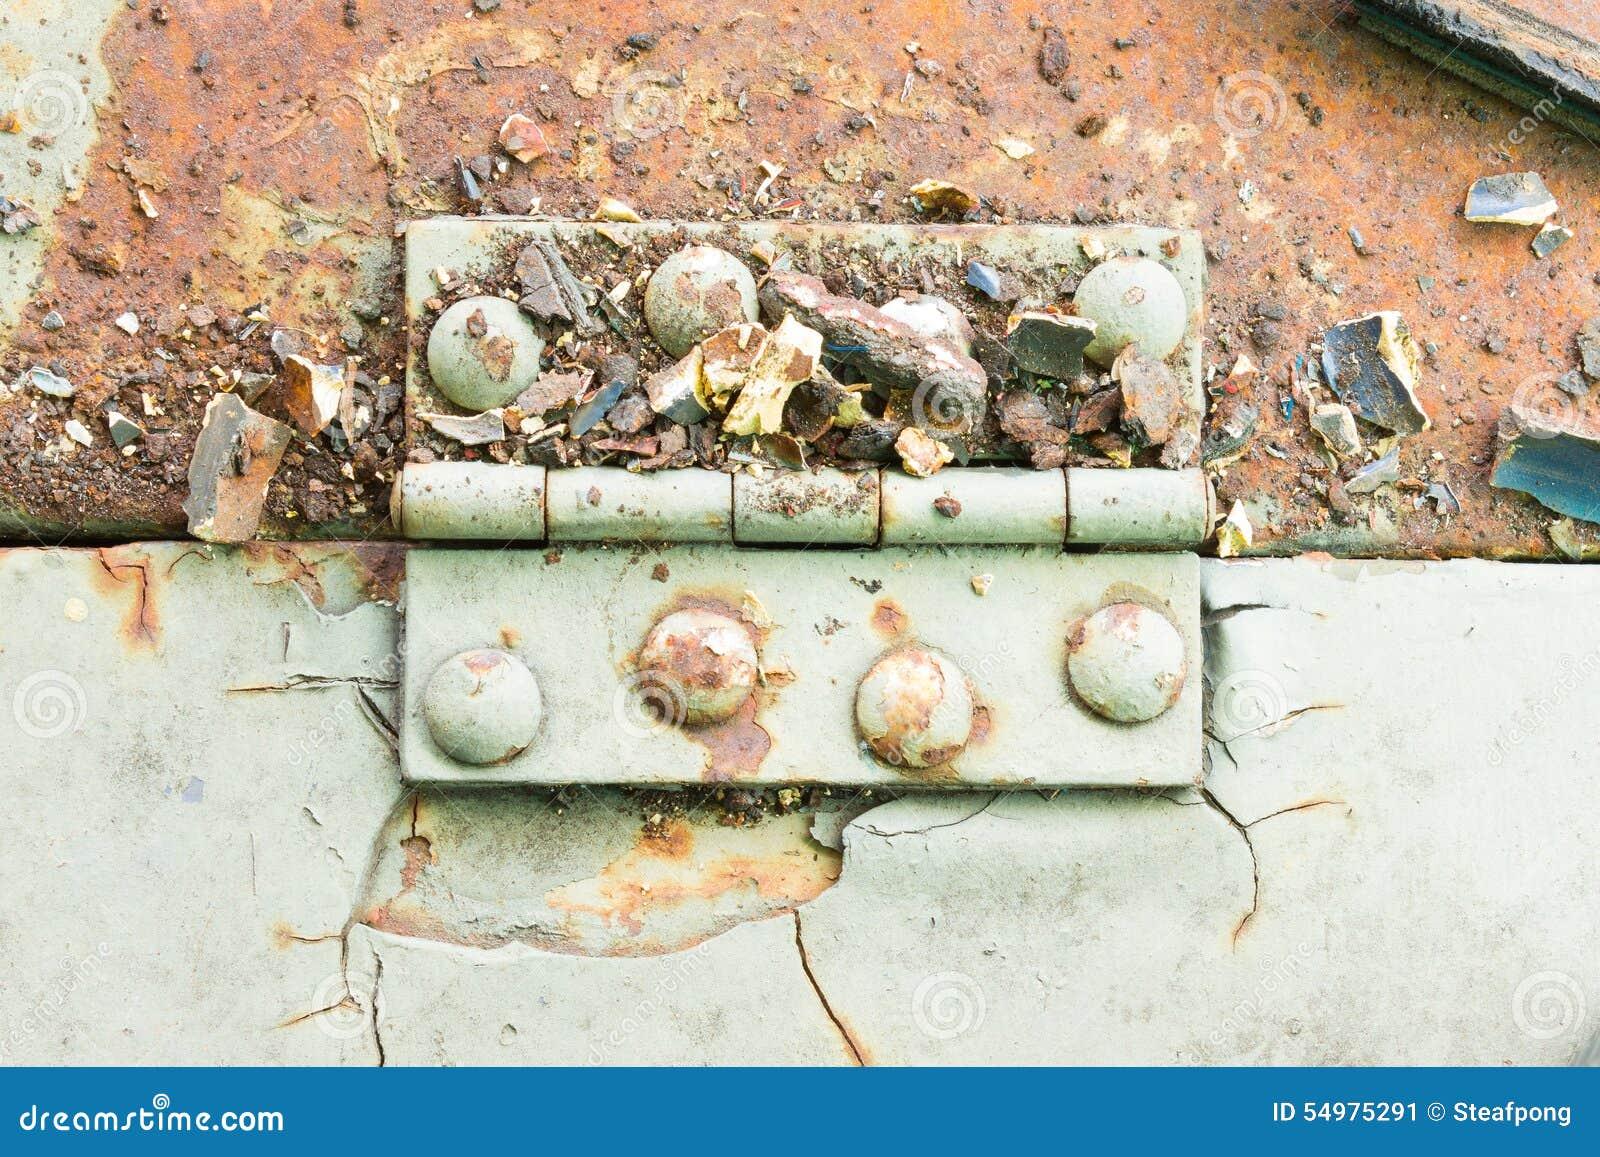 Шарнир и ржавчина и заклепка на старом салатовом металлическом листе горизонтальном